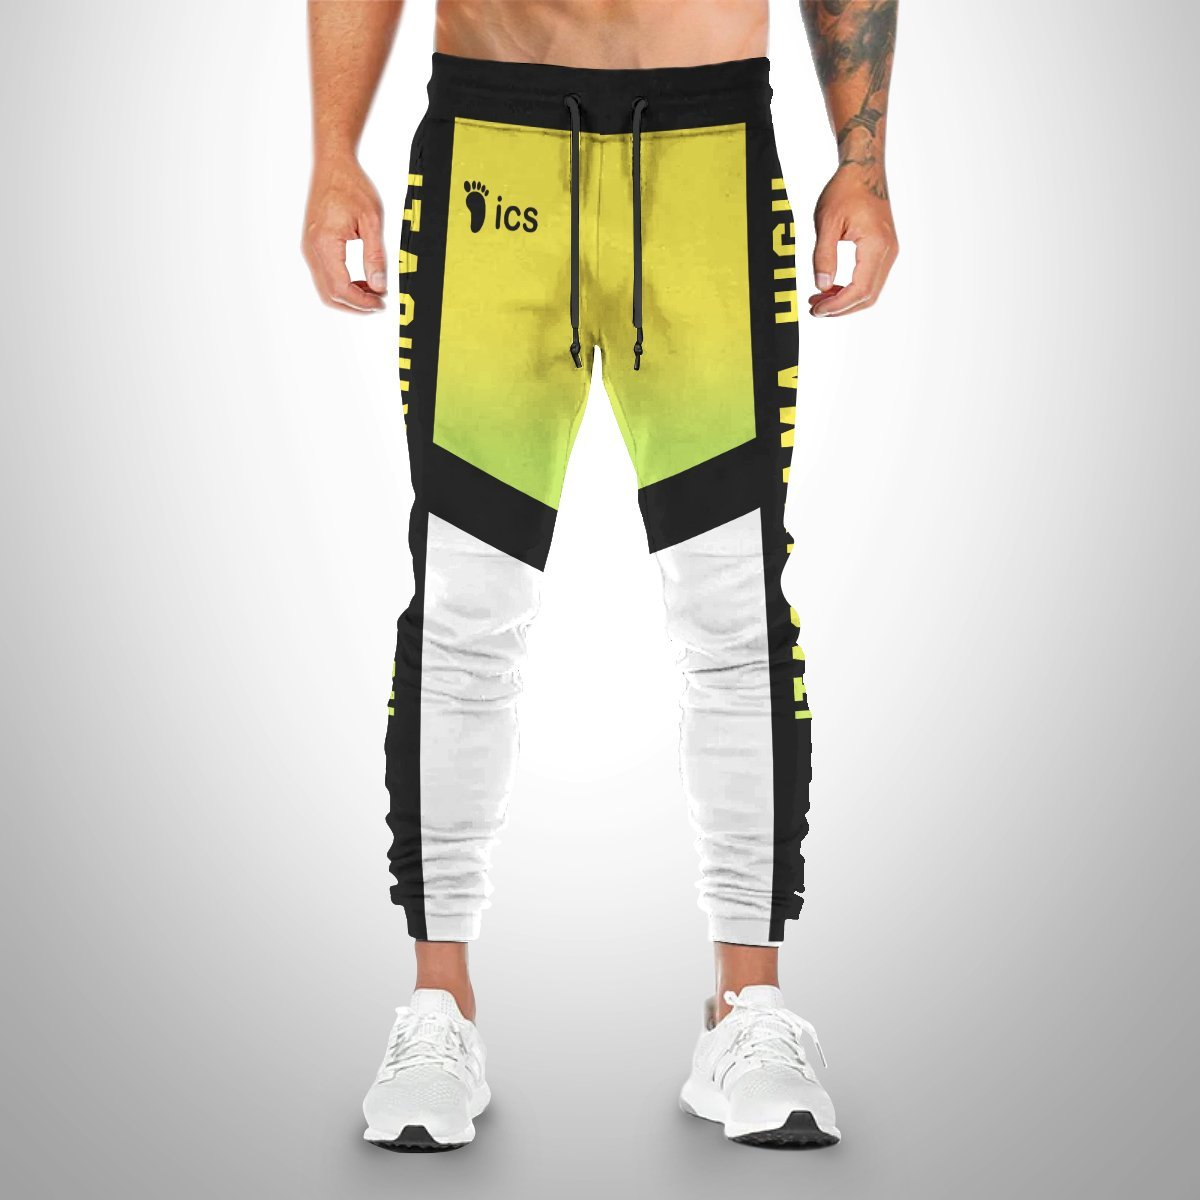 team itachiyama jogger pants 731820 - Otaku Treat